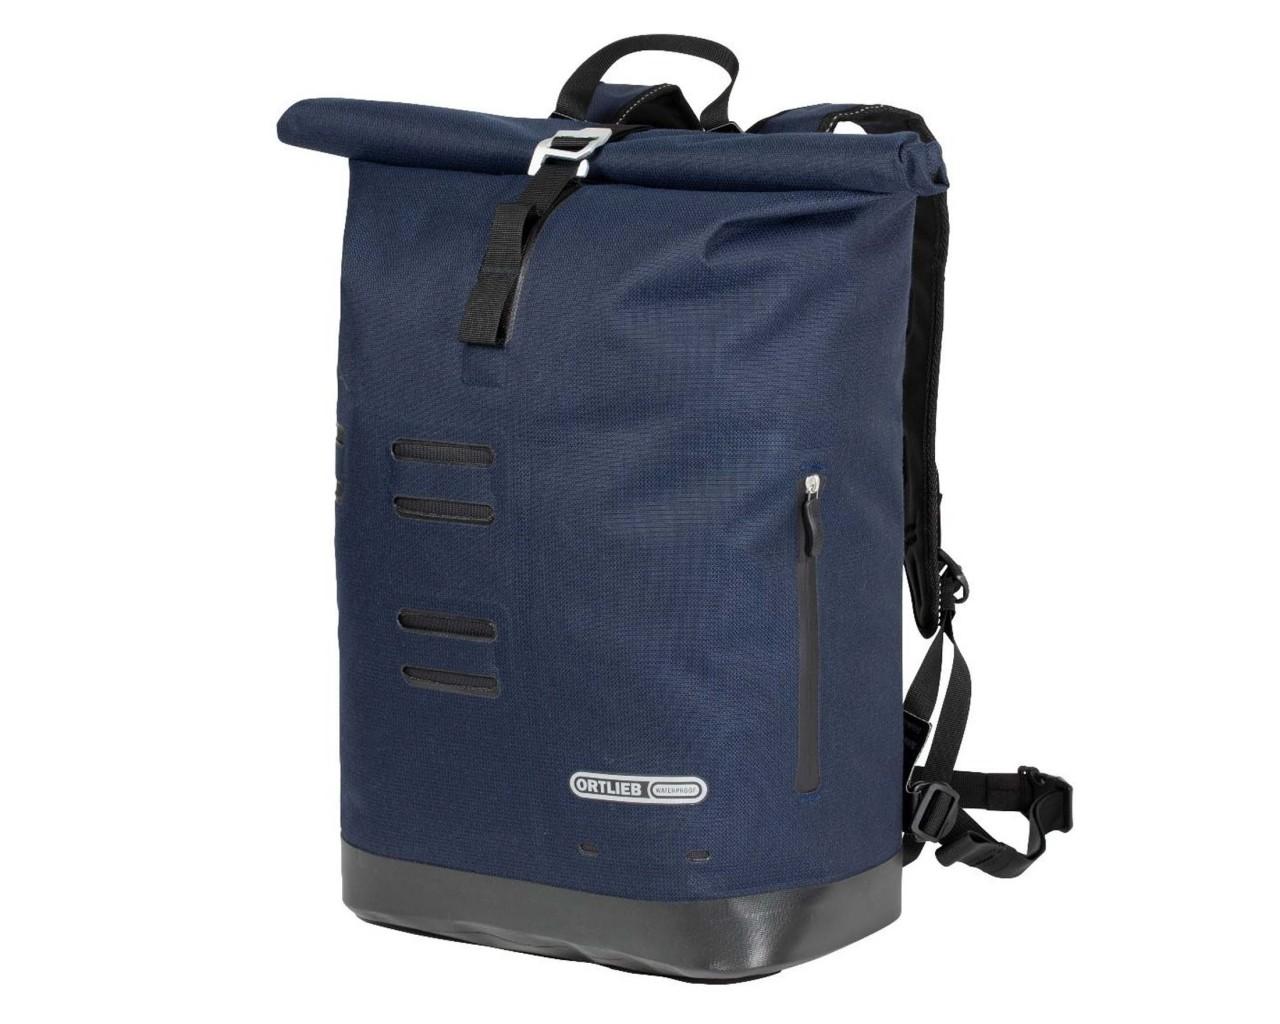 Ortlieb Commuter-Daypack Urban Line 27 litres waterproof backpack PVC-free | ink